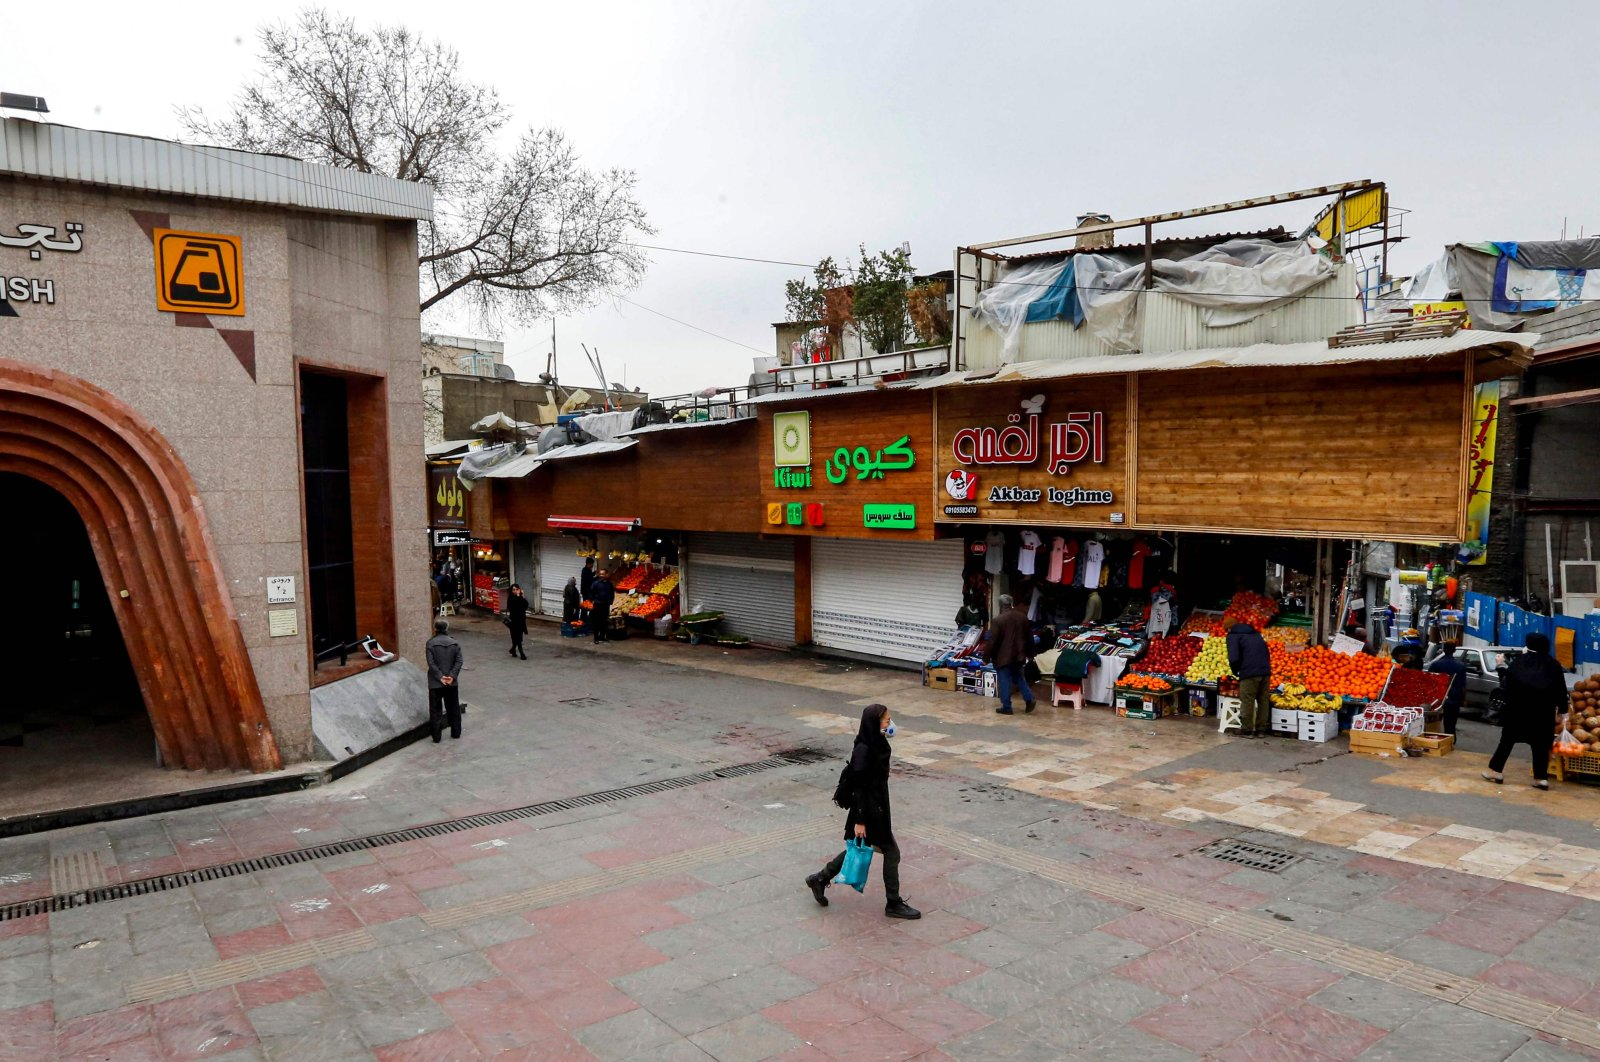 A woman wearing a protective face mask walks past Tajrish bazaar in Iran's capital Tehran on March 14, 2020. (AFP Photo)